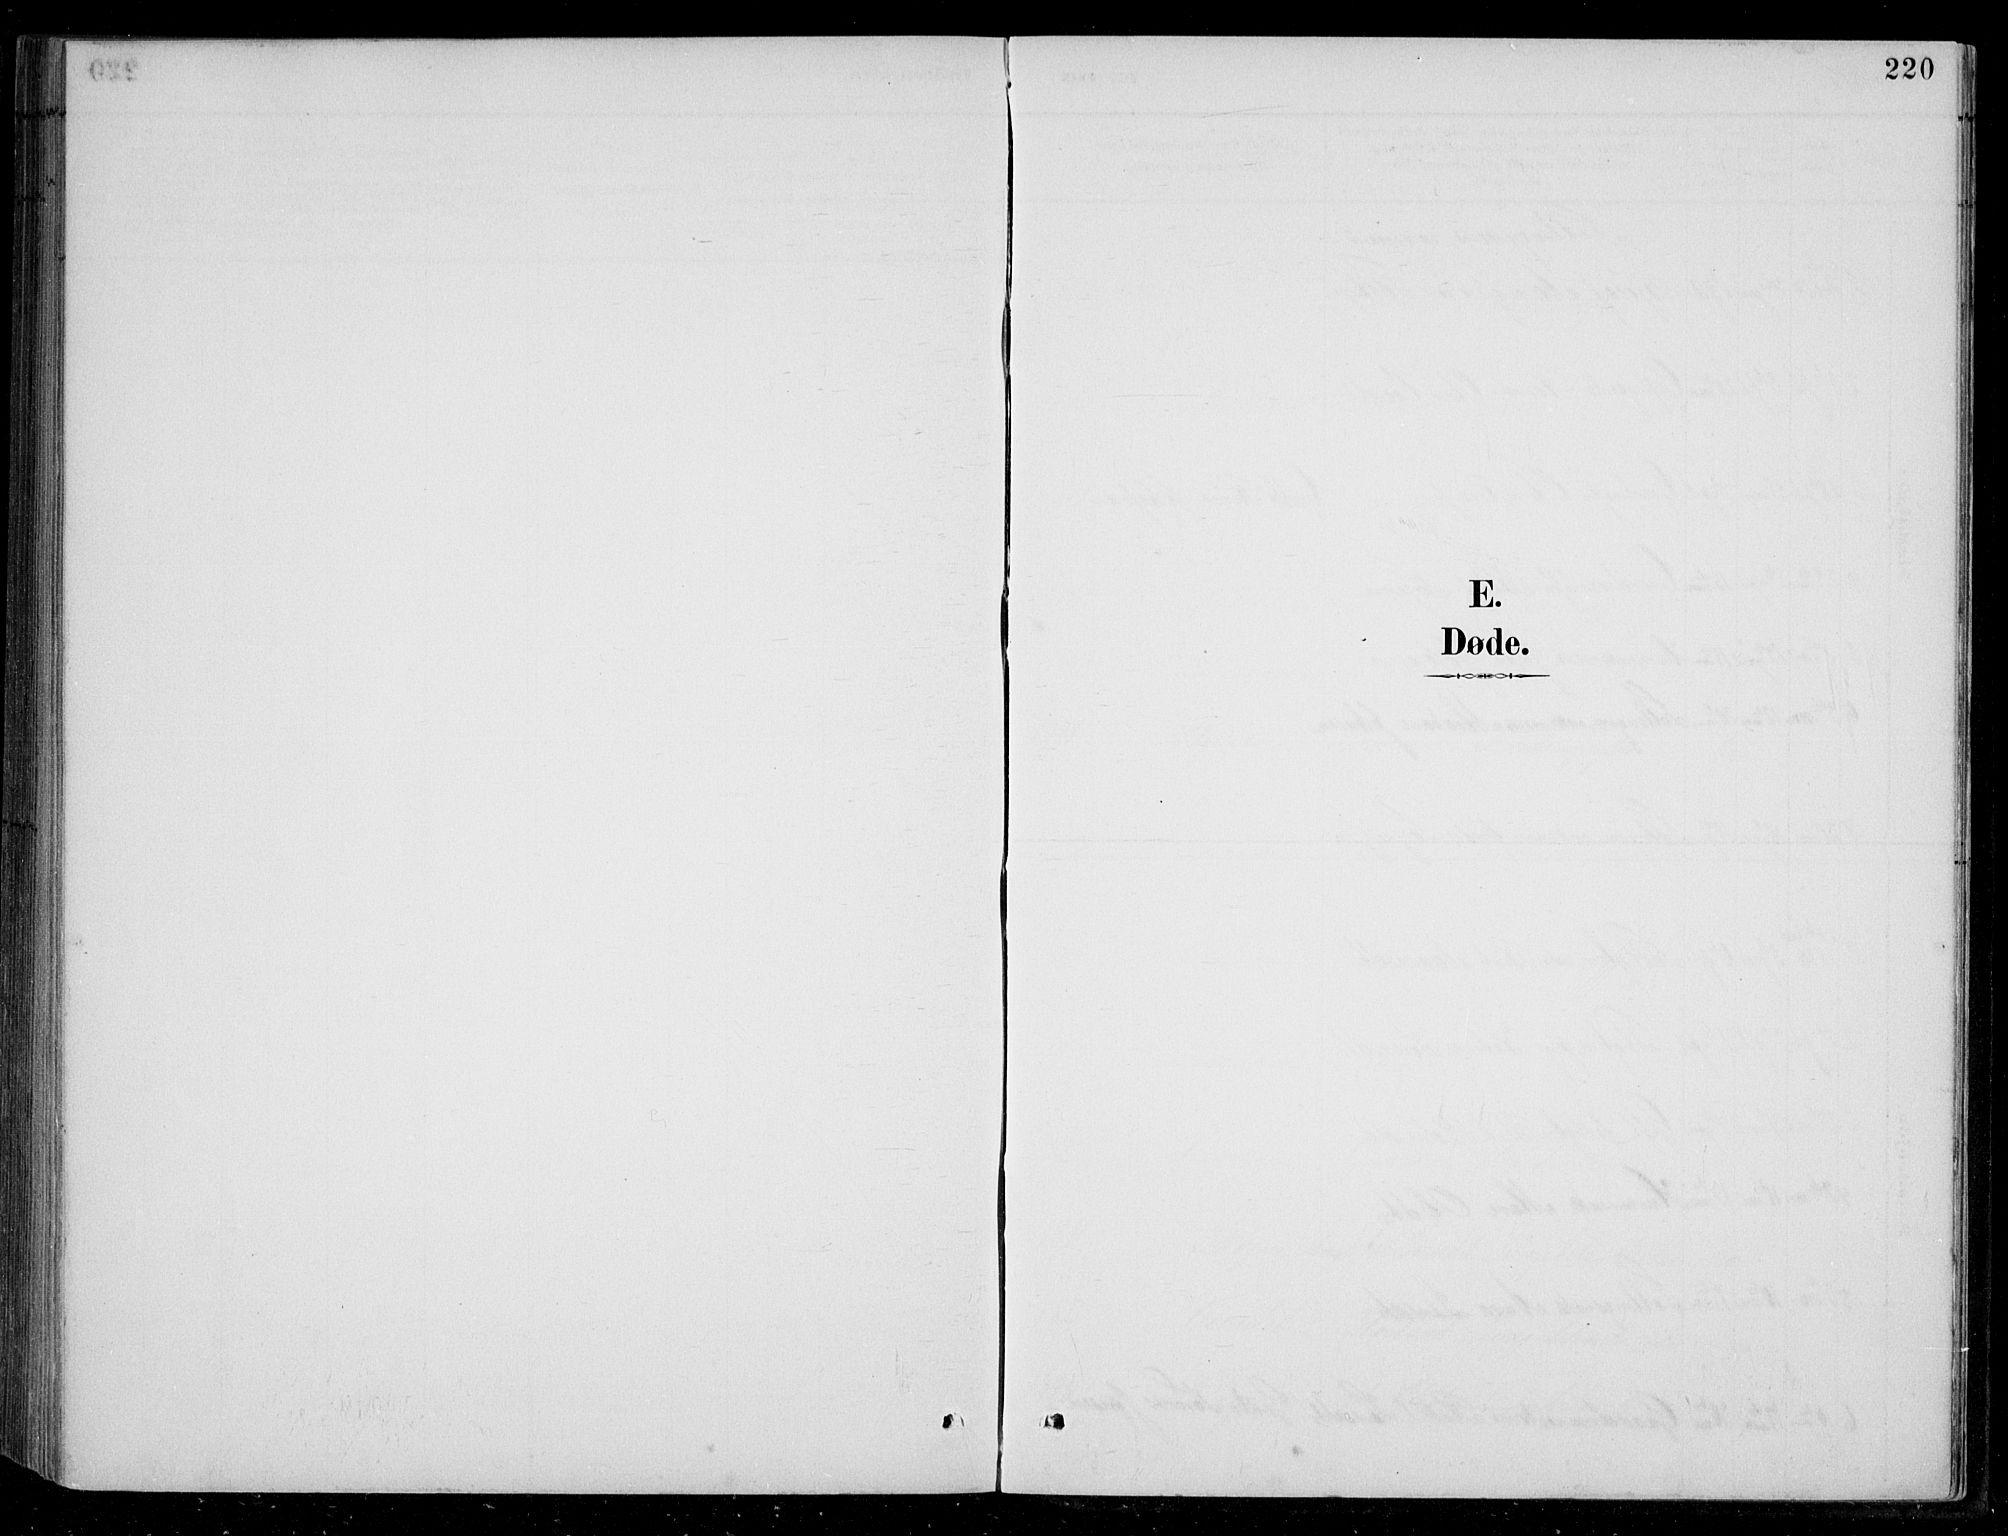 SAK, Bjelland sokneprestkontor, F/Fb/Fbc/L0003: Klokkerbok nr. B 3, 1887-1924, s. 220